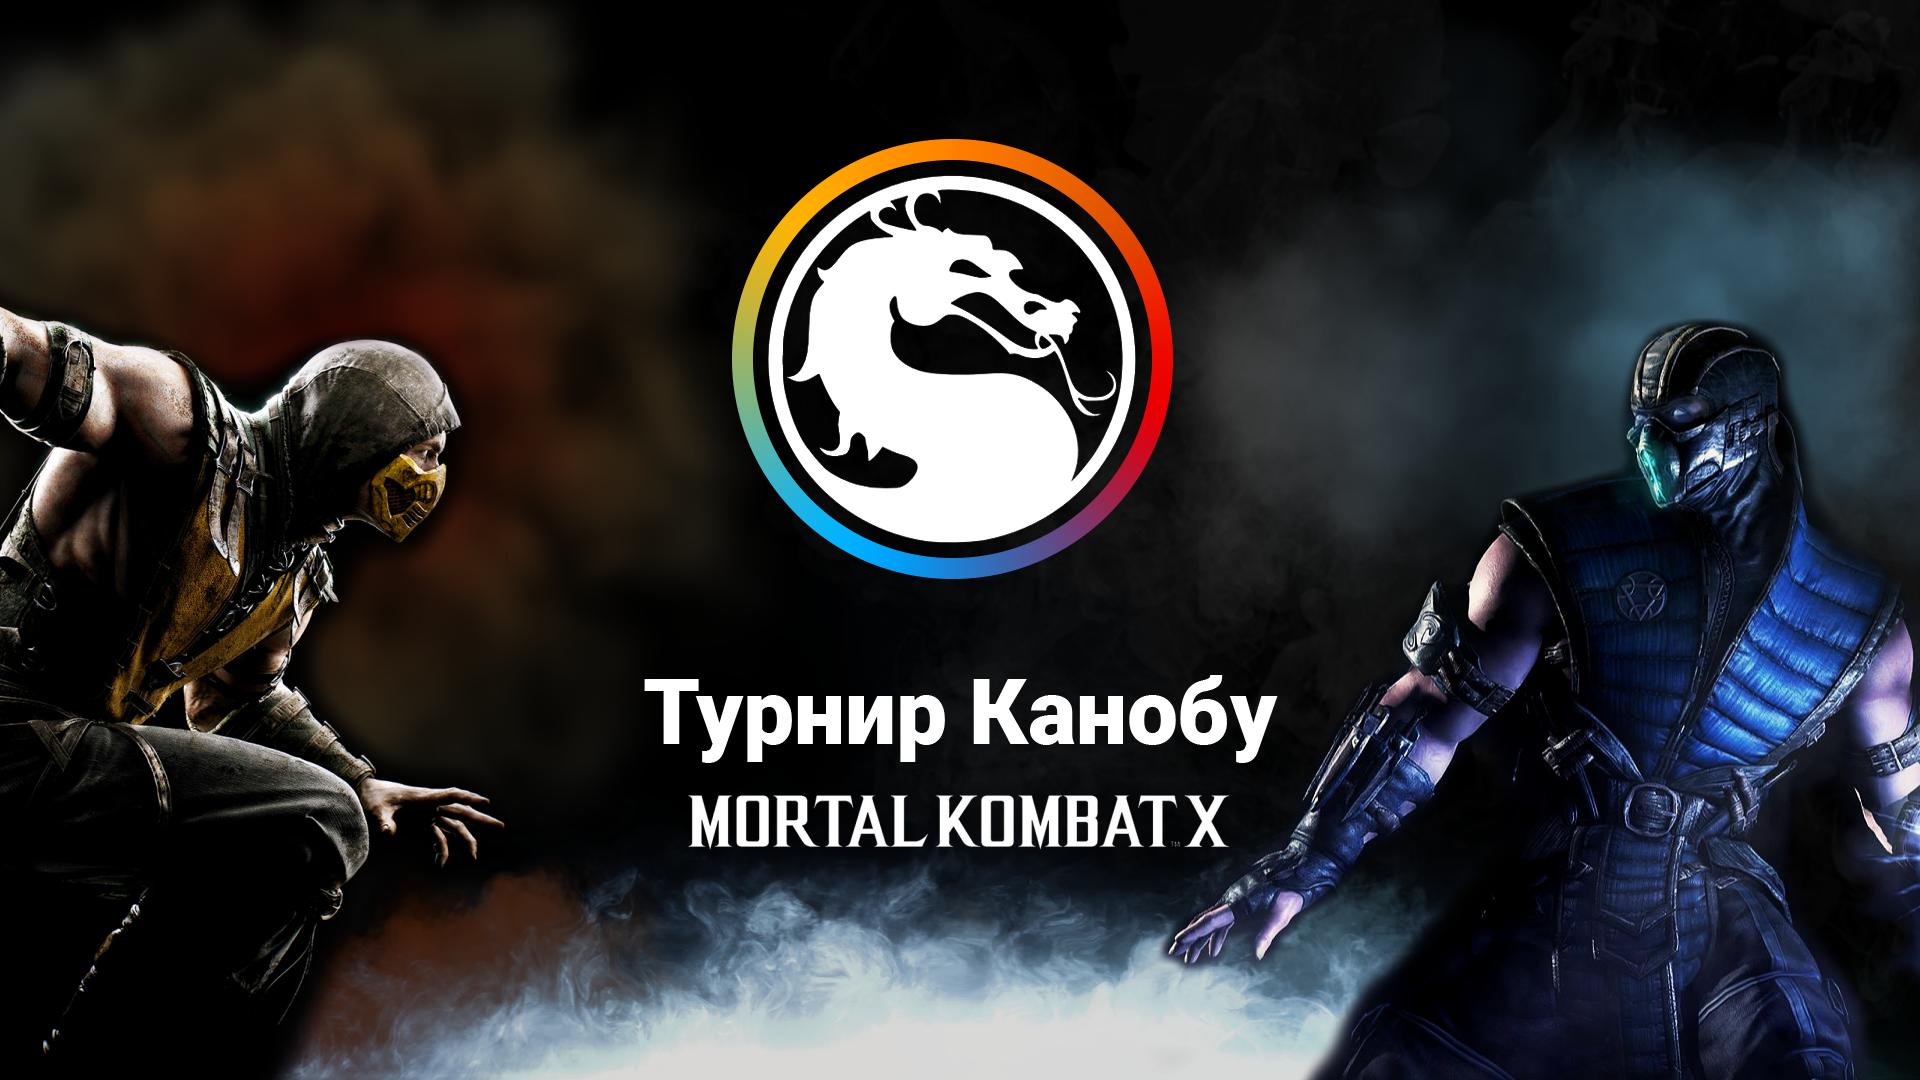 Плей-офф турнира Канобу по Mortal Kombat X! - Изображение 1